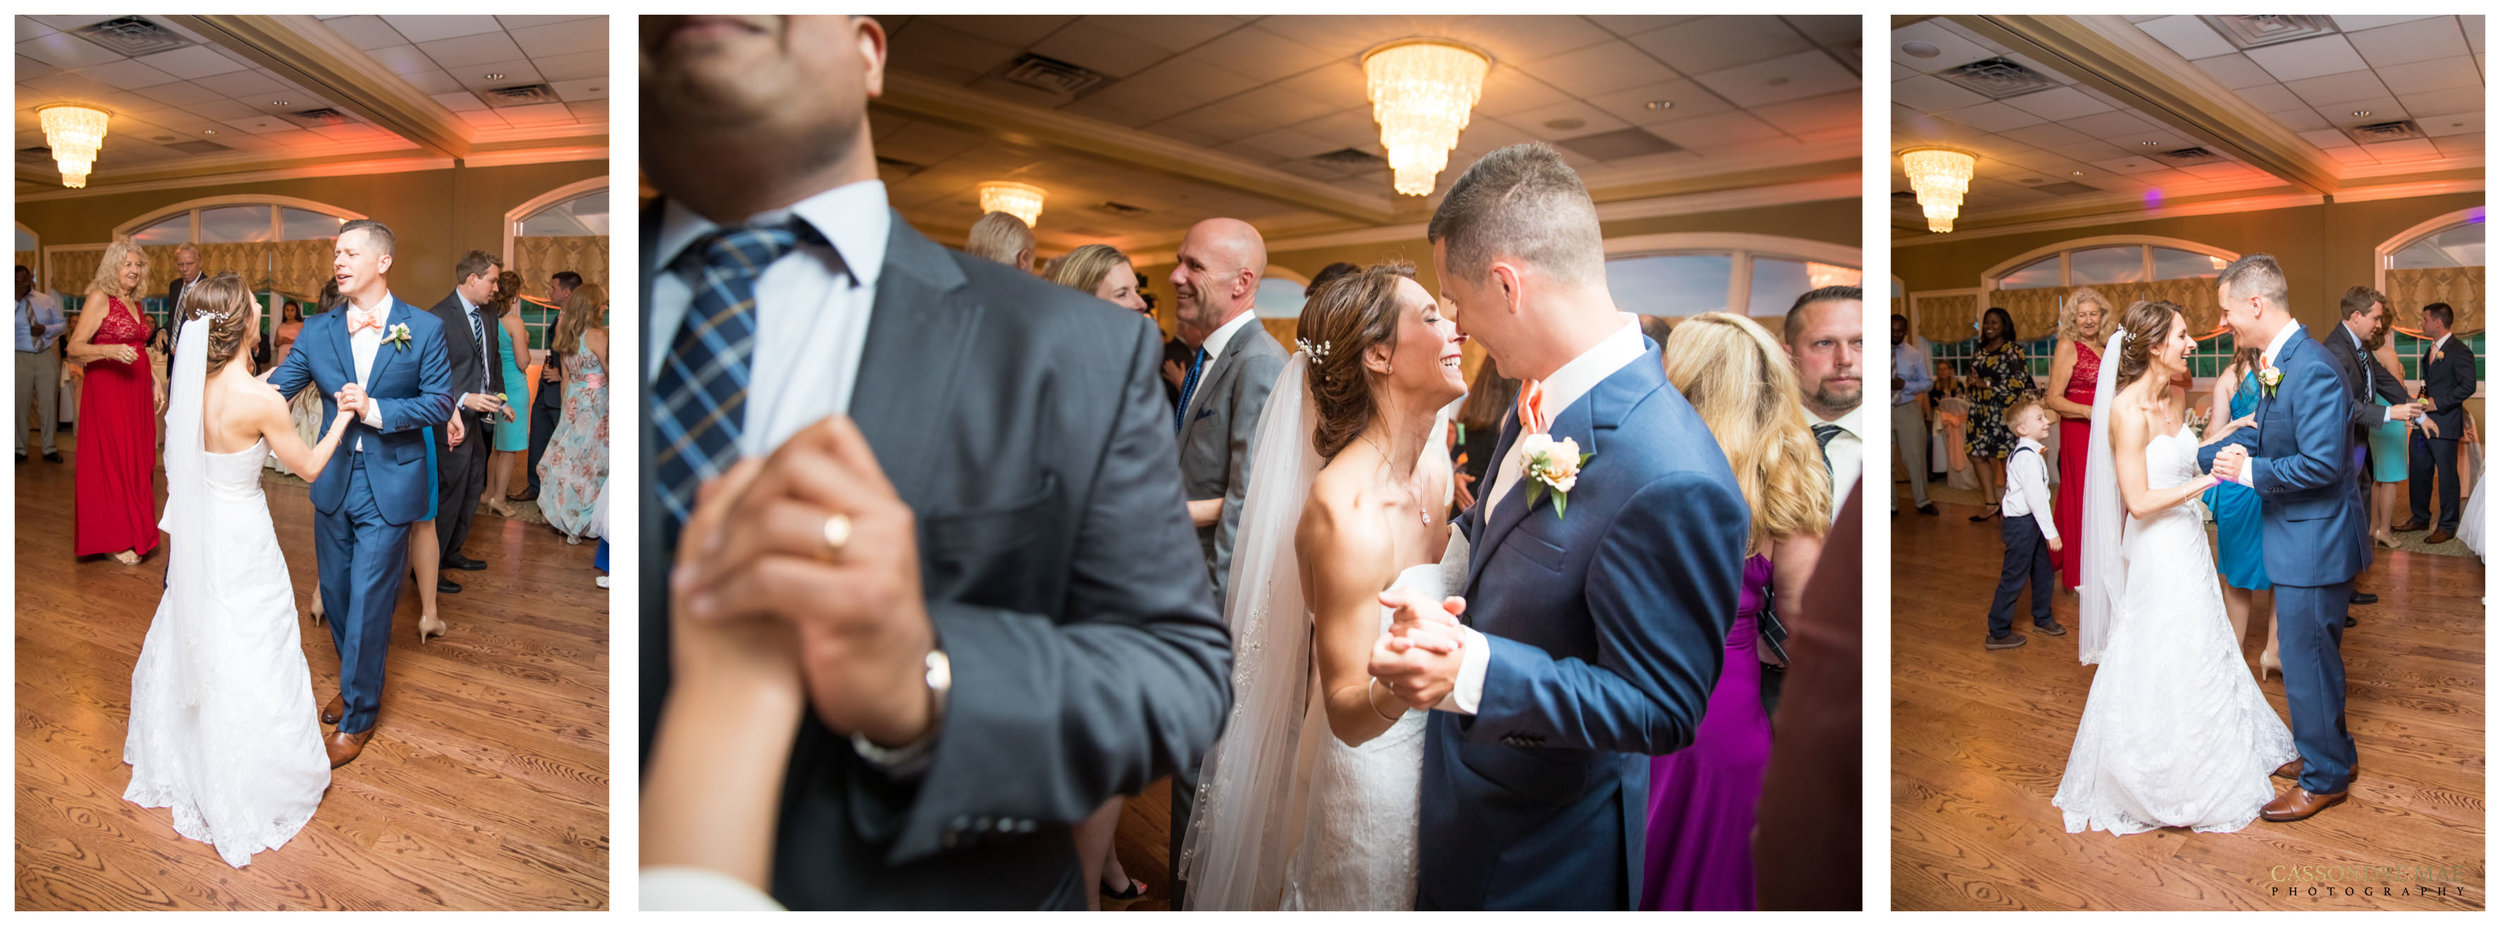 Cassondre Mae Photography Links at Unionvale Wedding 22.jpg